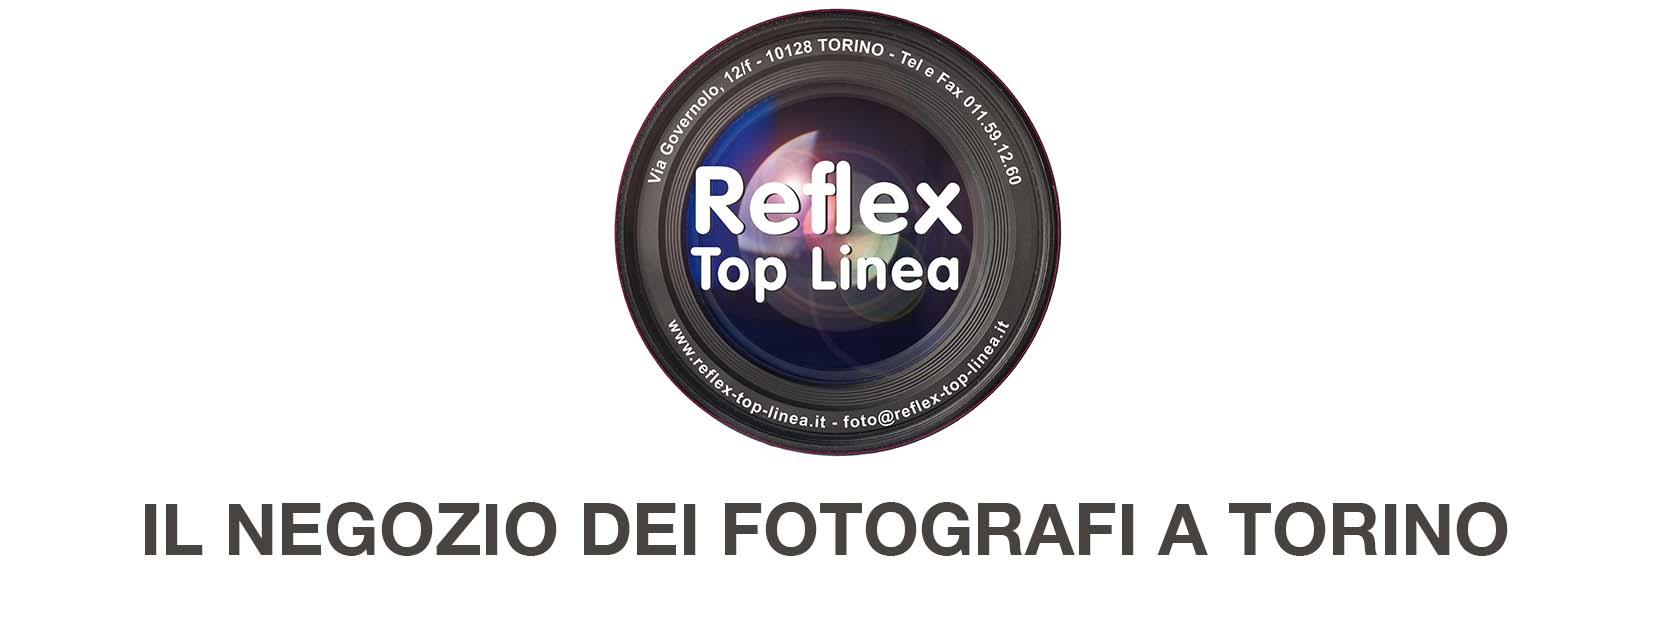 reflex-top-linea